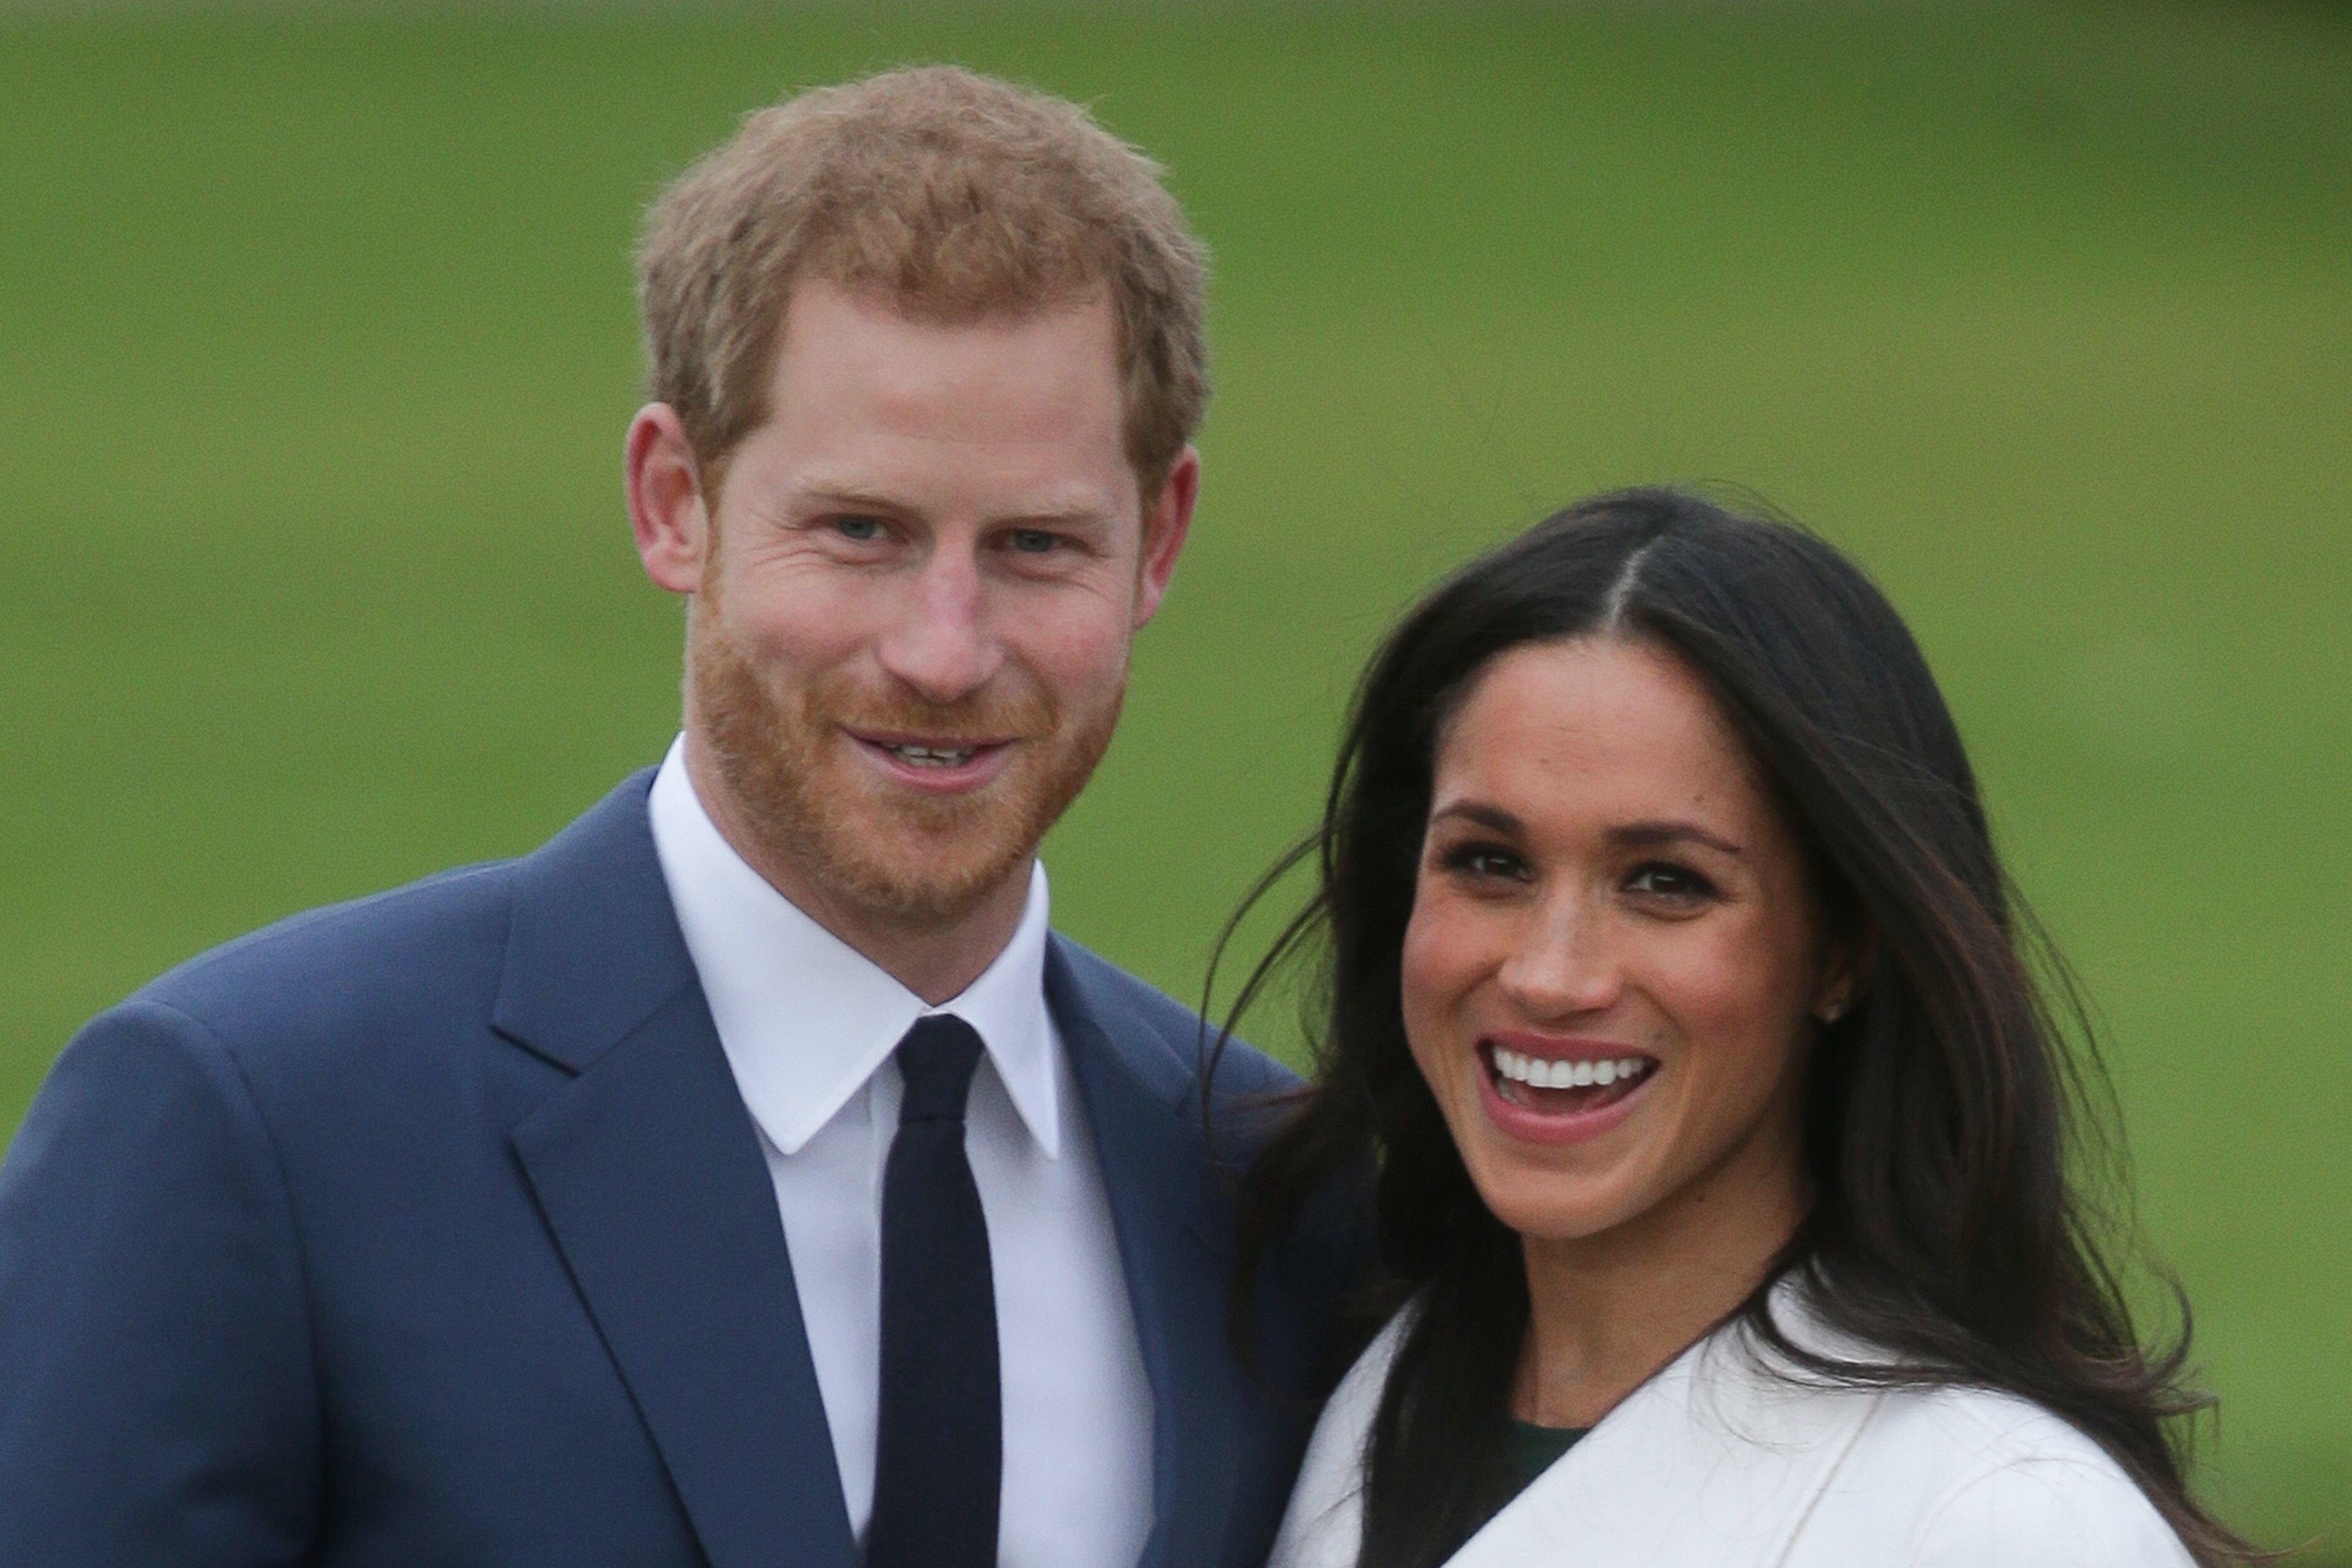 The Royal Wedding Drama Around Meghan Markle's Dad,